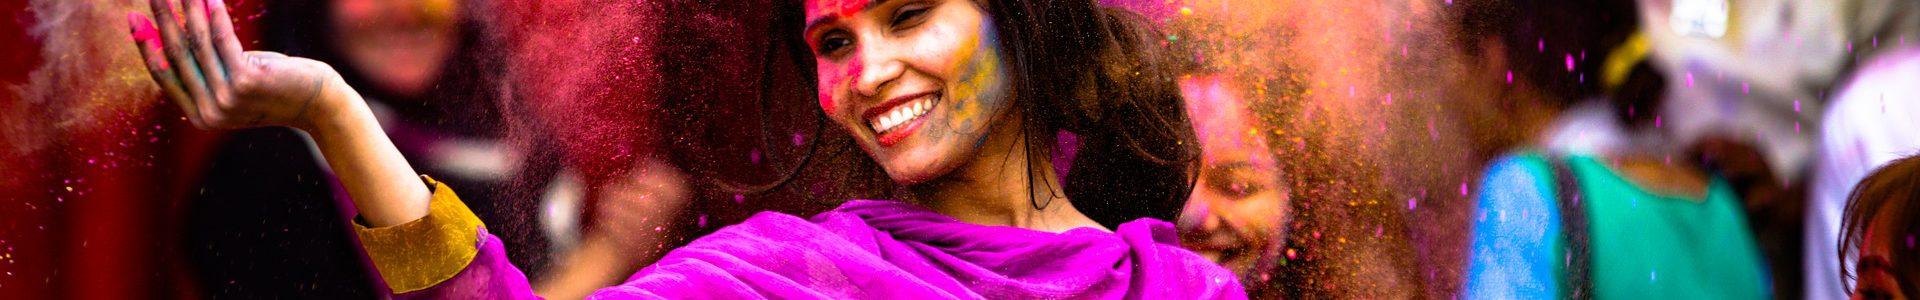 The Yoga Sutras By Patanjali: The Niyamas